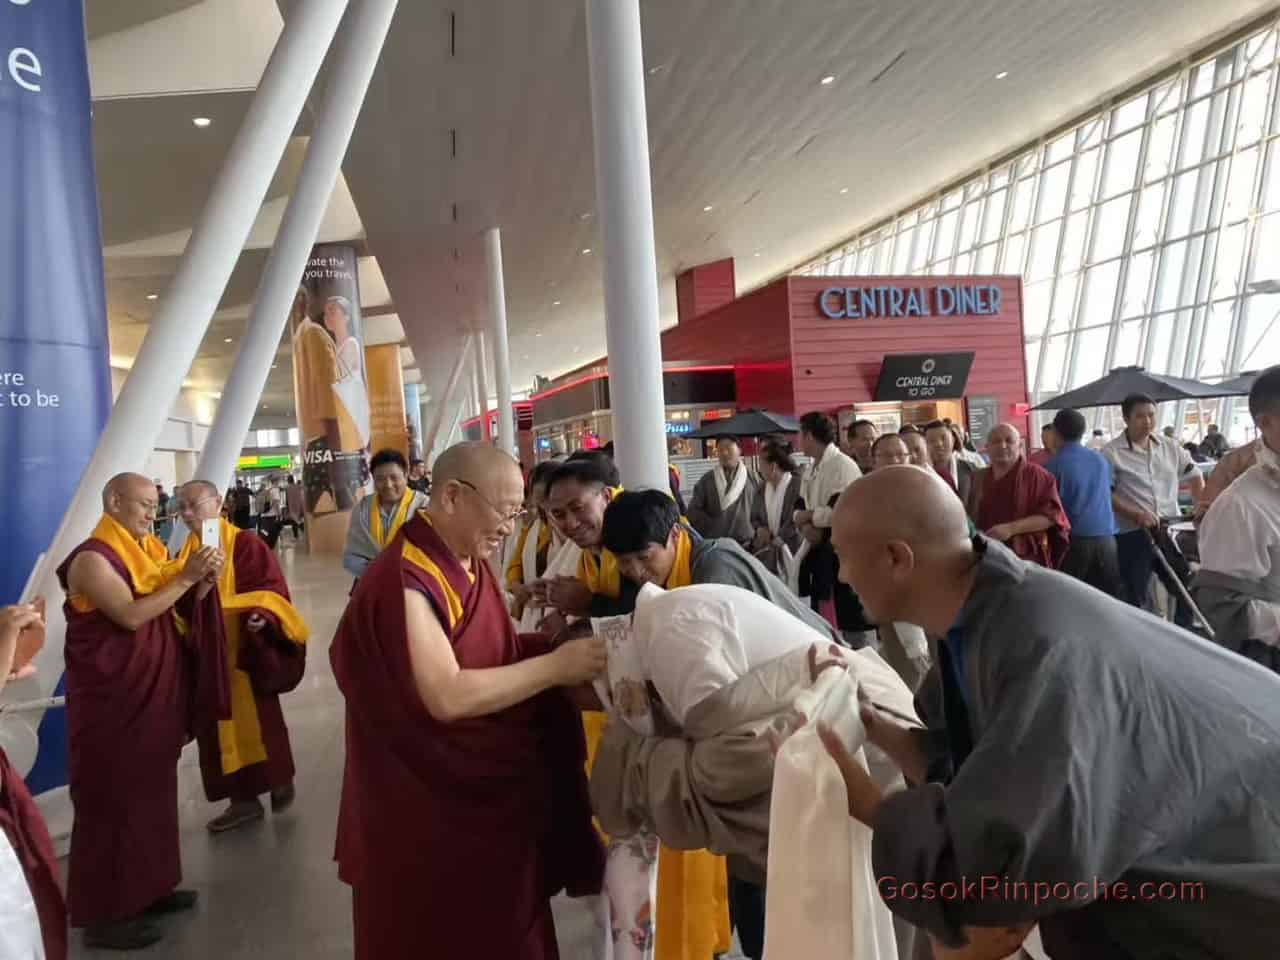 Gosok Rinpoche NYC airport 20190926184809